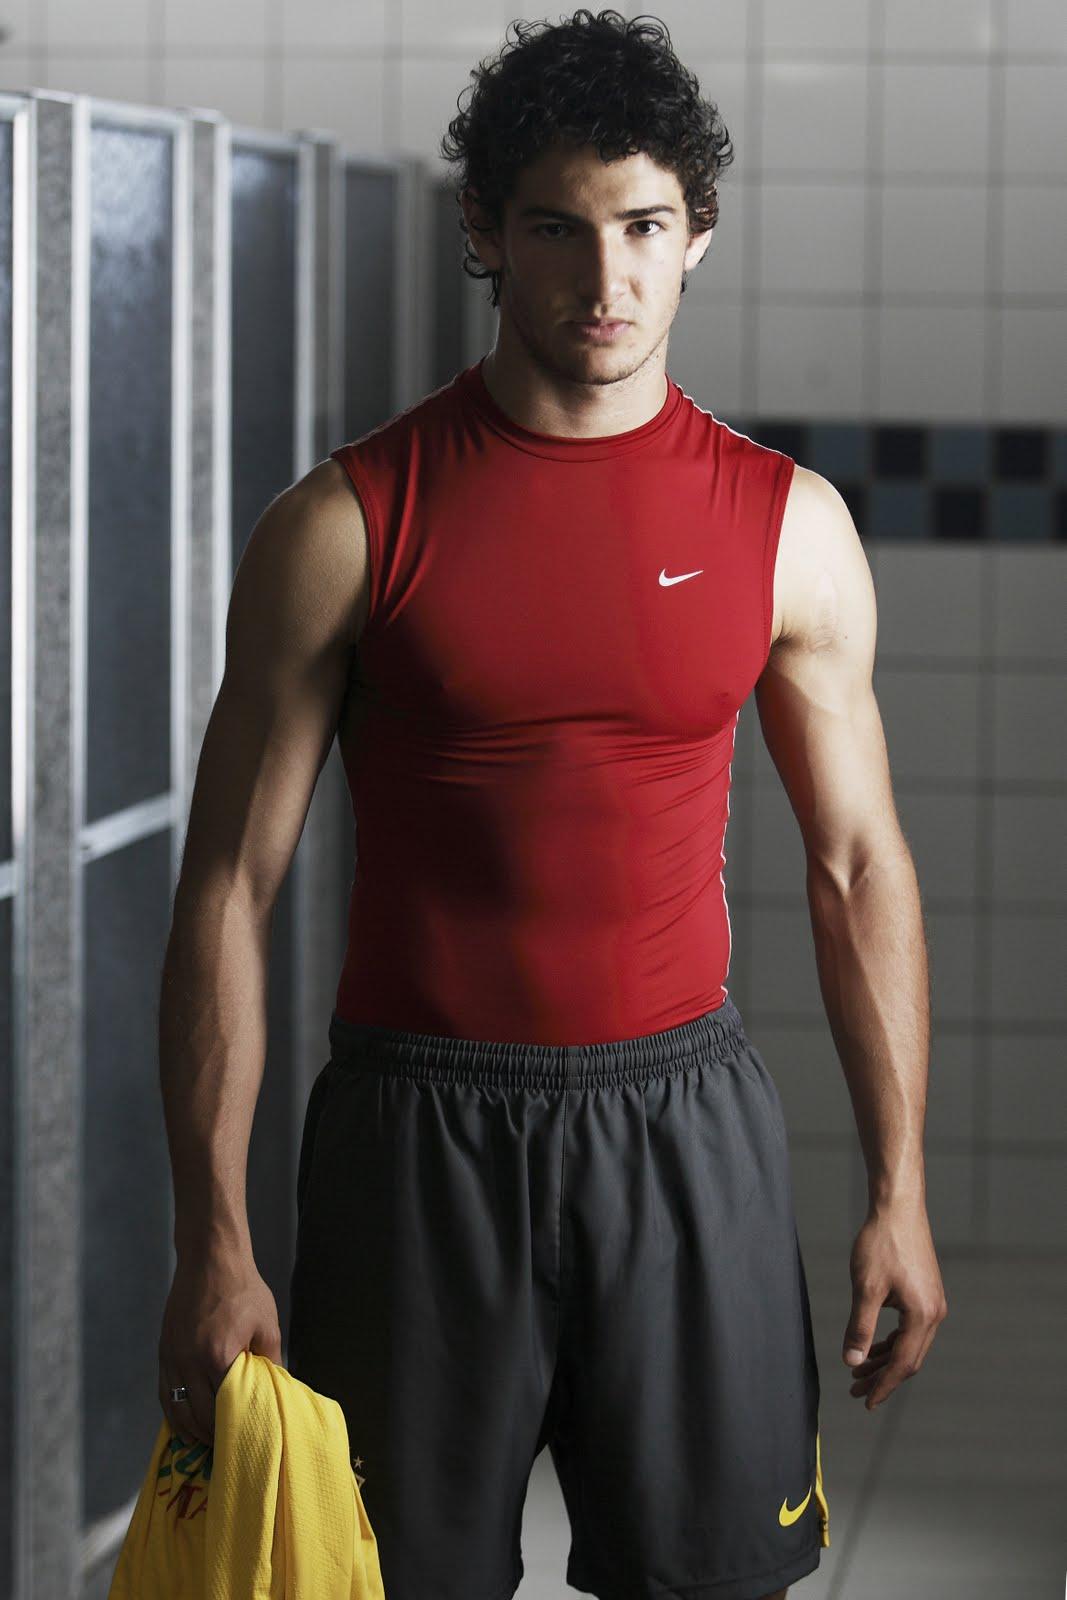 http://4.bp.blogspot.com/_eiTZ-nCywi0/S6wKboyDV9I/AAAAAAAAAIo/5ox7Pq48L0Q/s1600/Pato+-+Nike2+(2333+x+3500).jpg